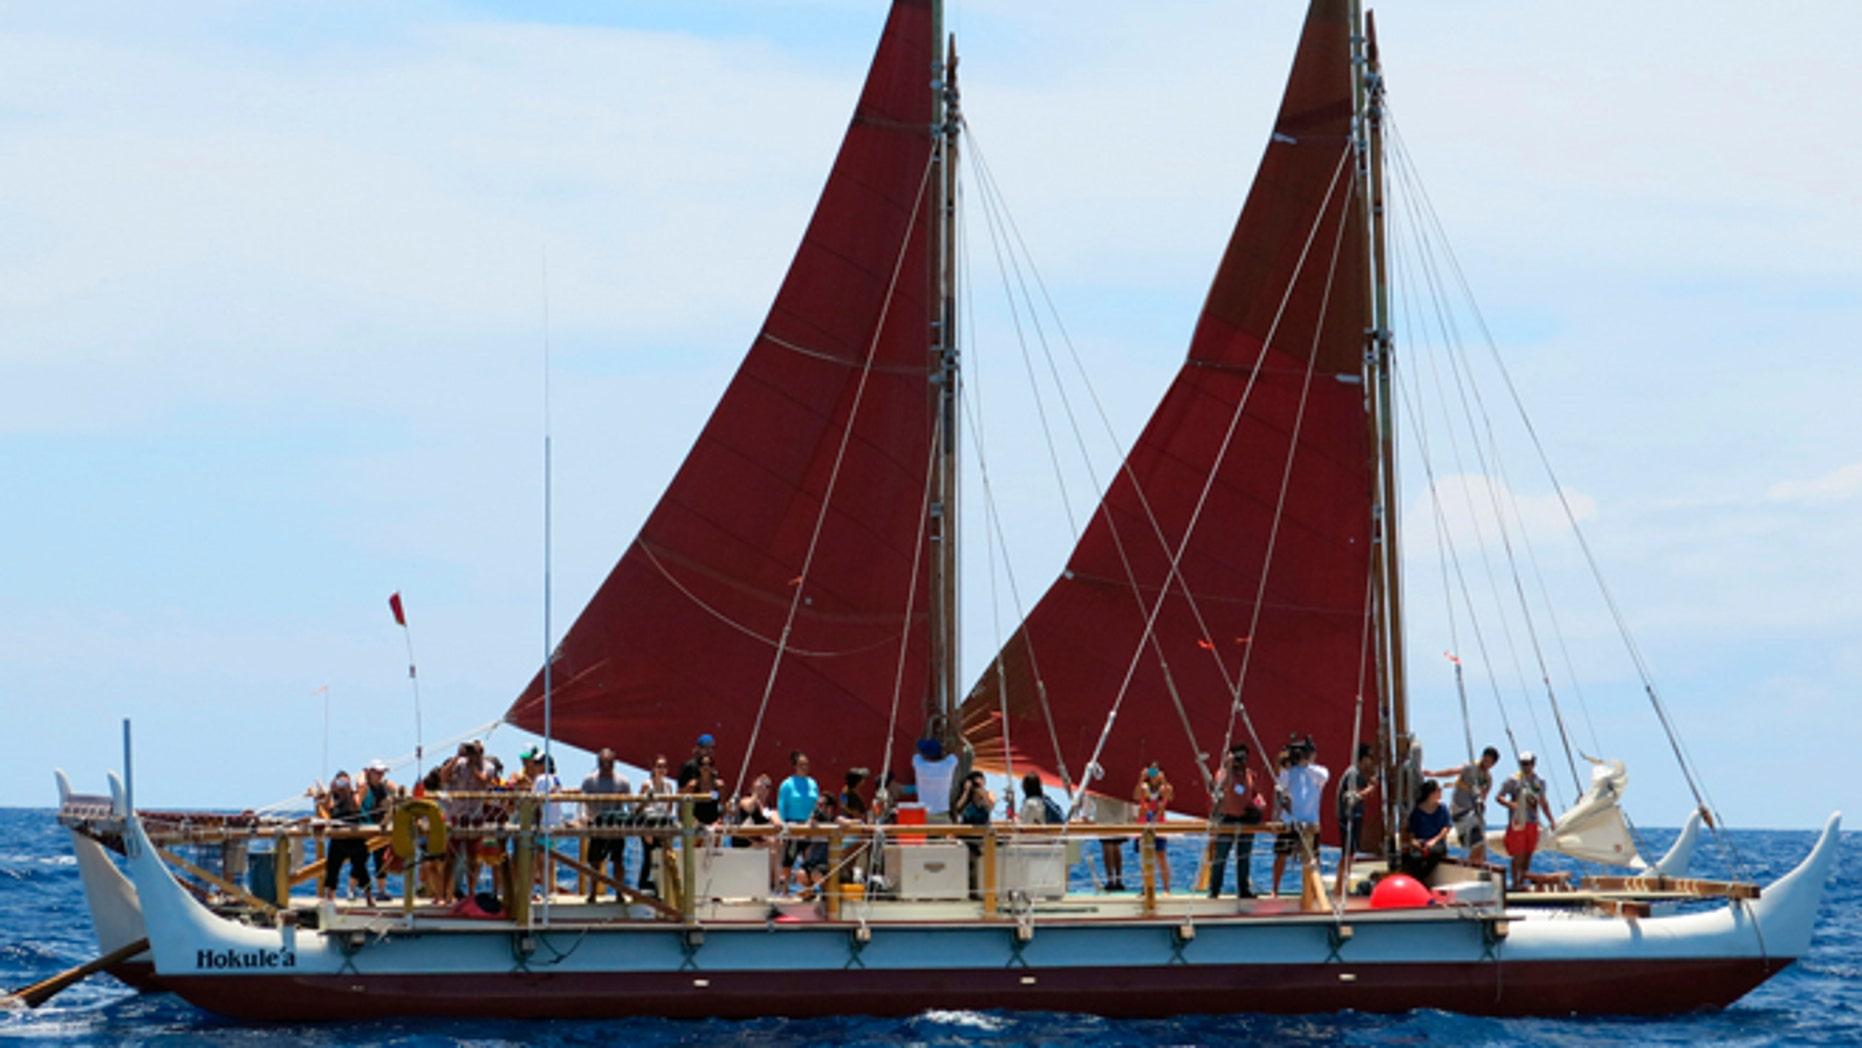 April 29, 2014: The Hokulea sailing canoe is seen off Honolulu.